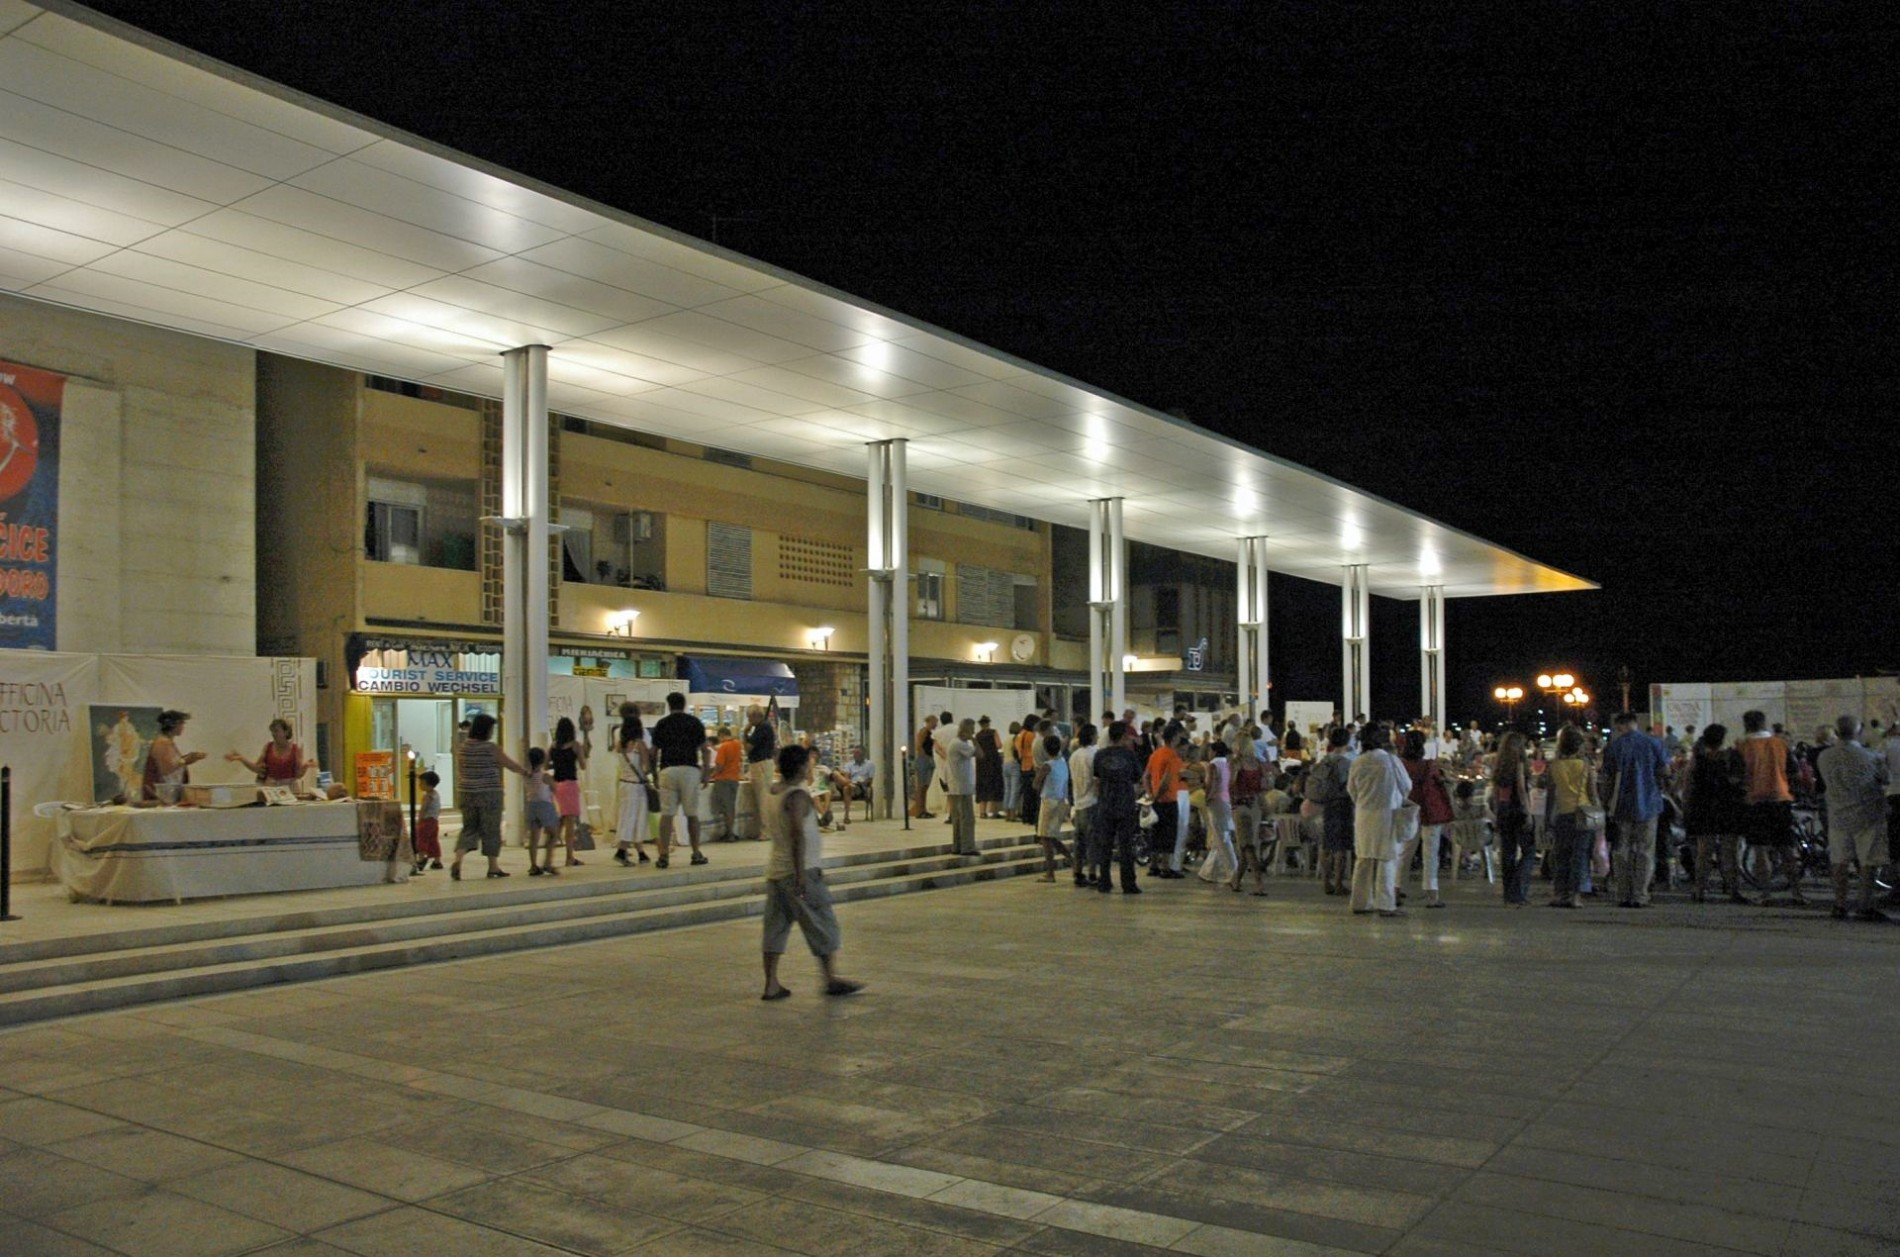 središnjki gradski trg u umagu, umag, središnji trg, gradski trg, main square in umag, structure, nenad fabijanić, konstrukcija, upi-2m